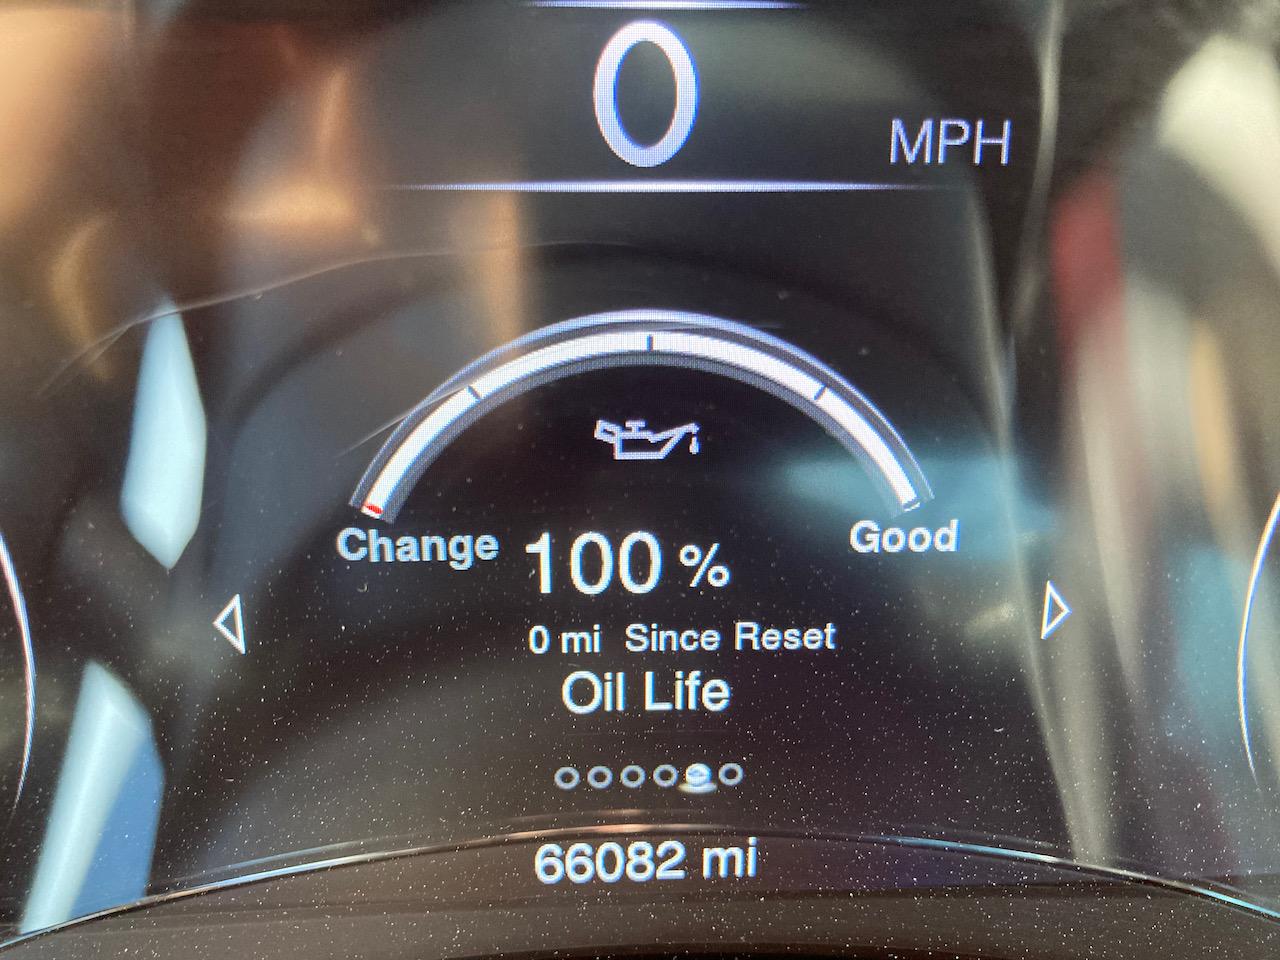 Car maintenance minder showing 100% oil life